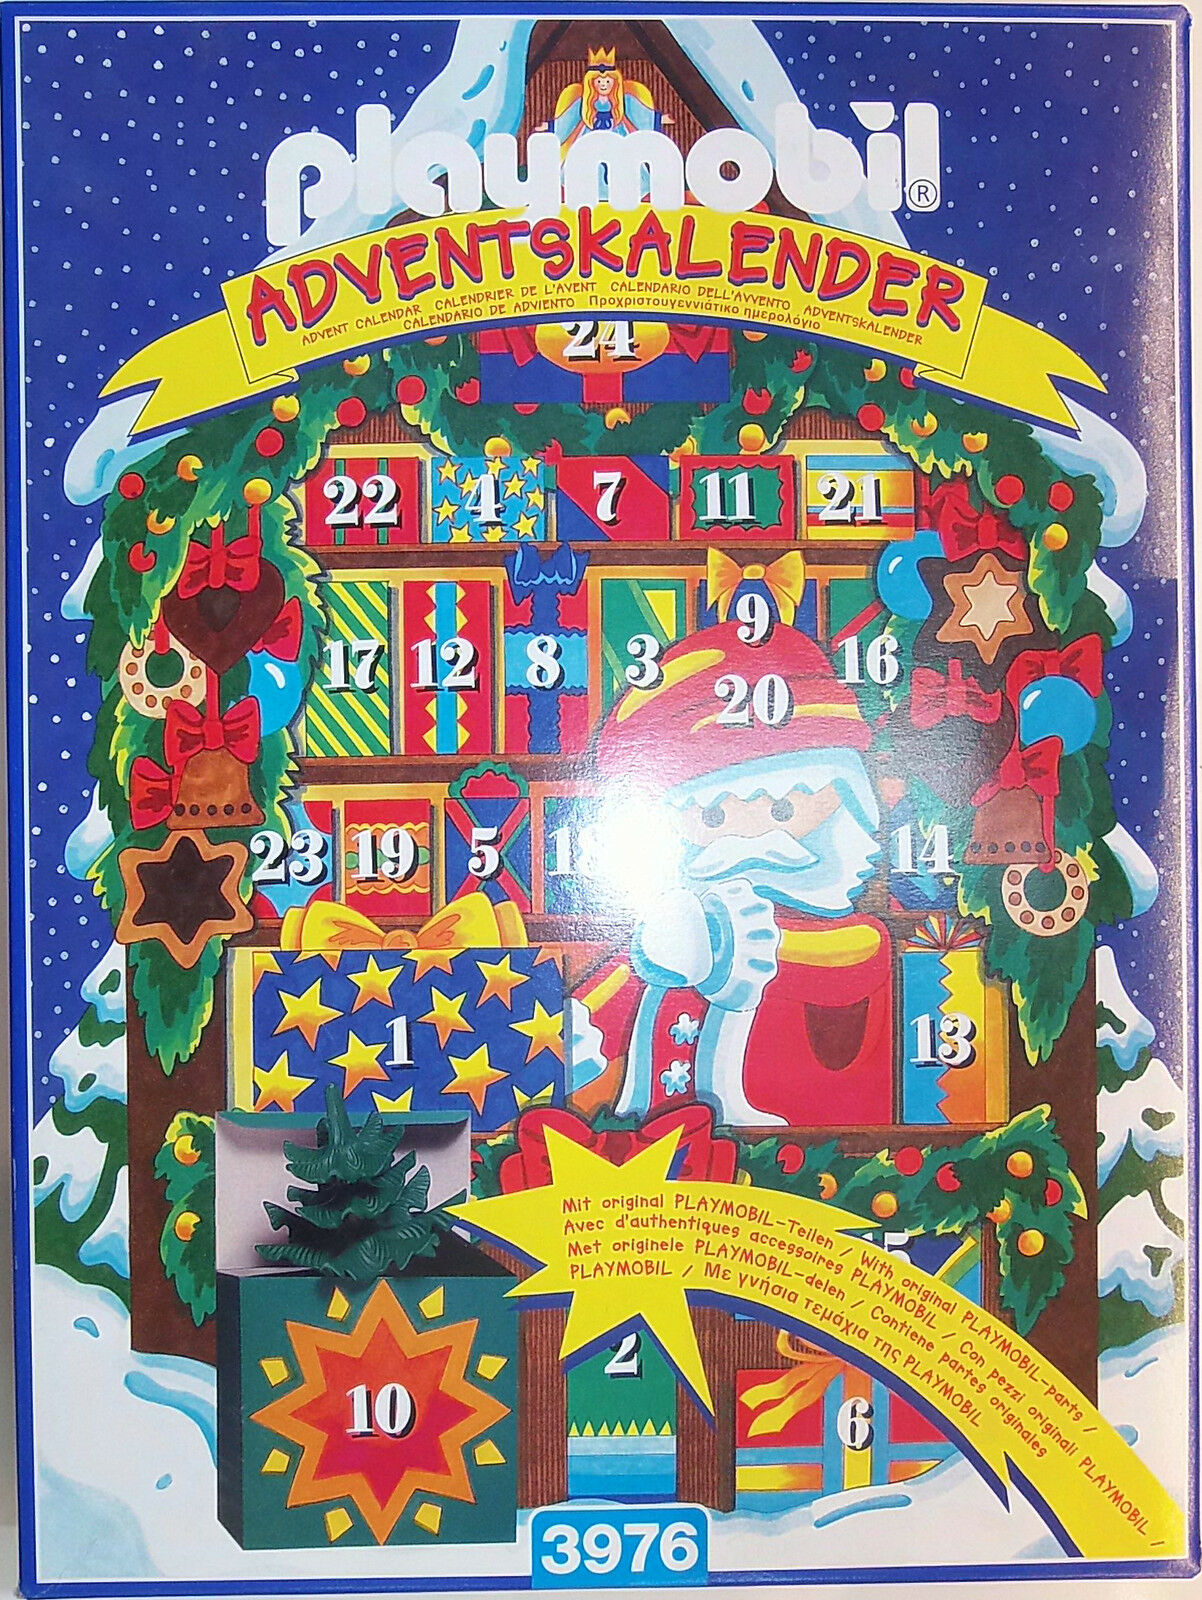 PLAYMOBIL 3976 Adventskalender Weihnachtsmarkt Christmas Market Advent Calendar